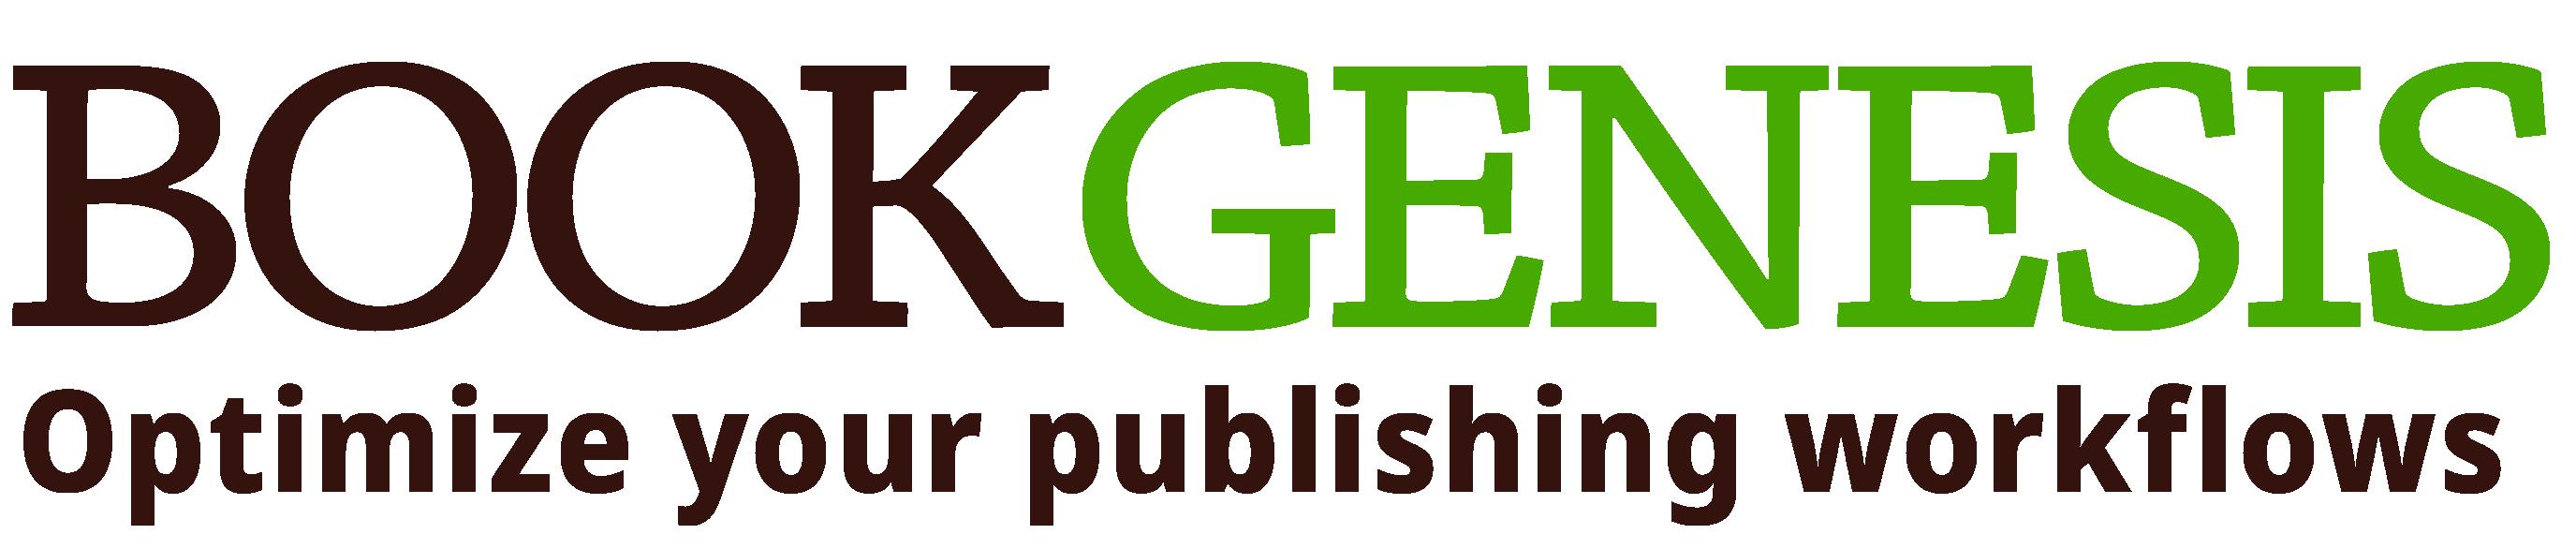 bookgenesis Logo